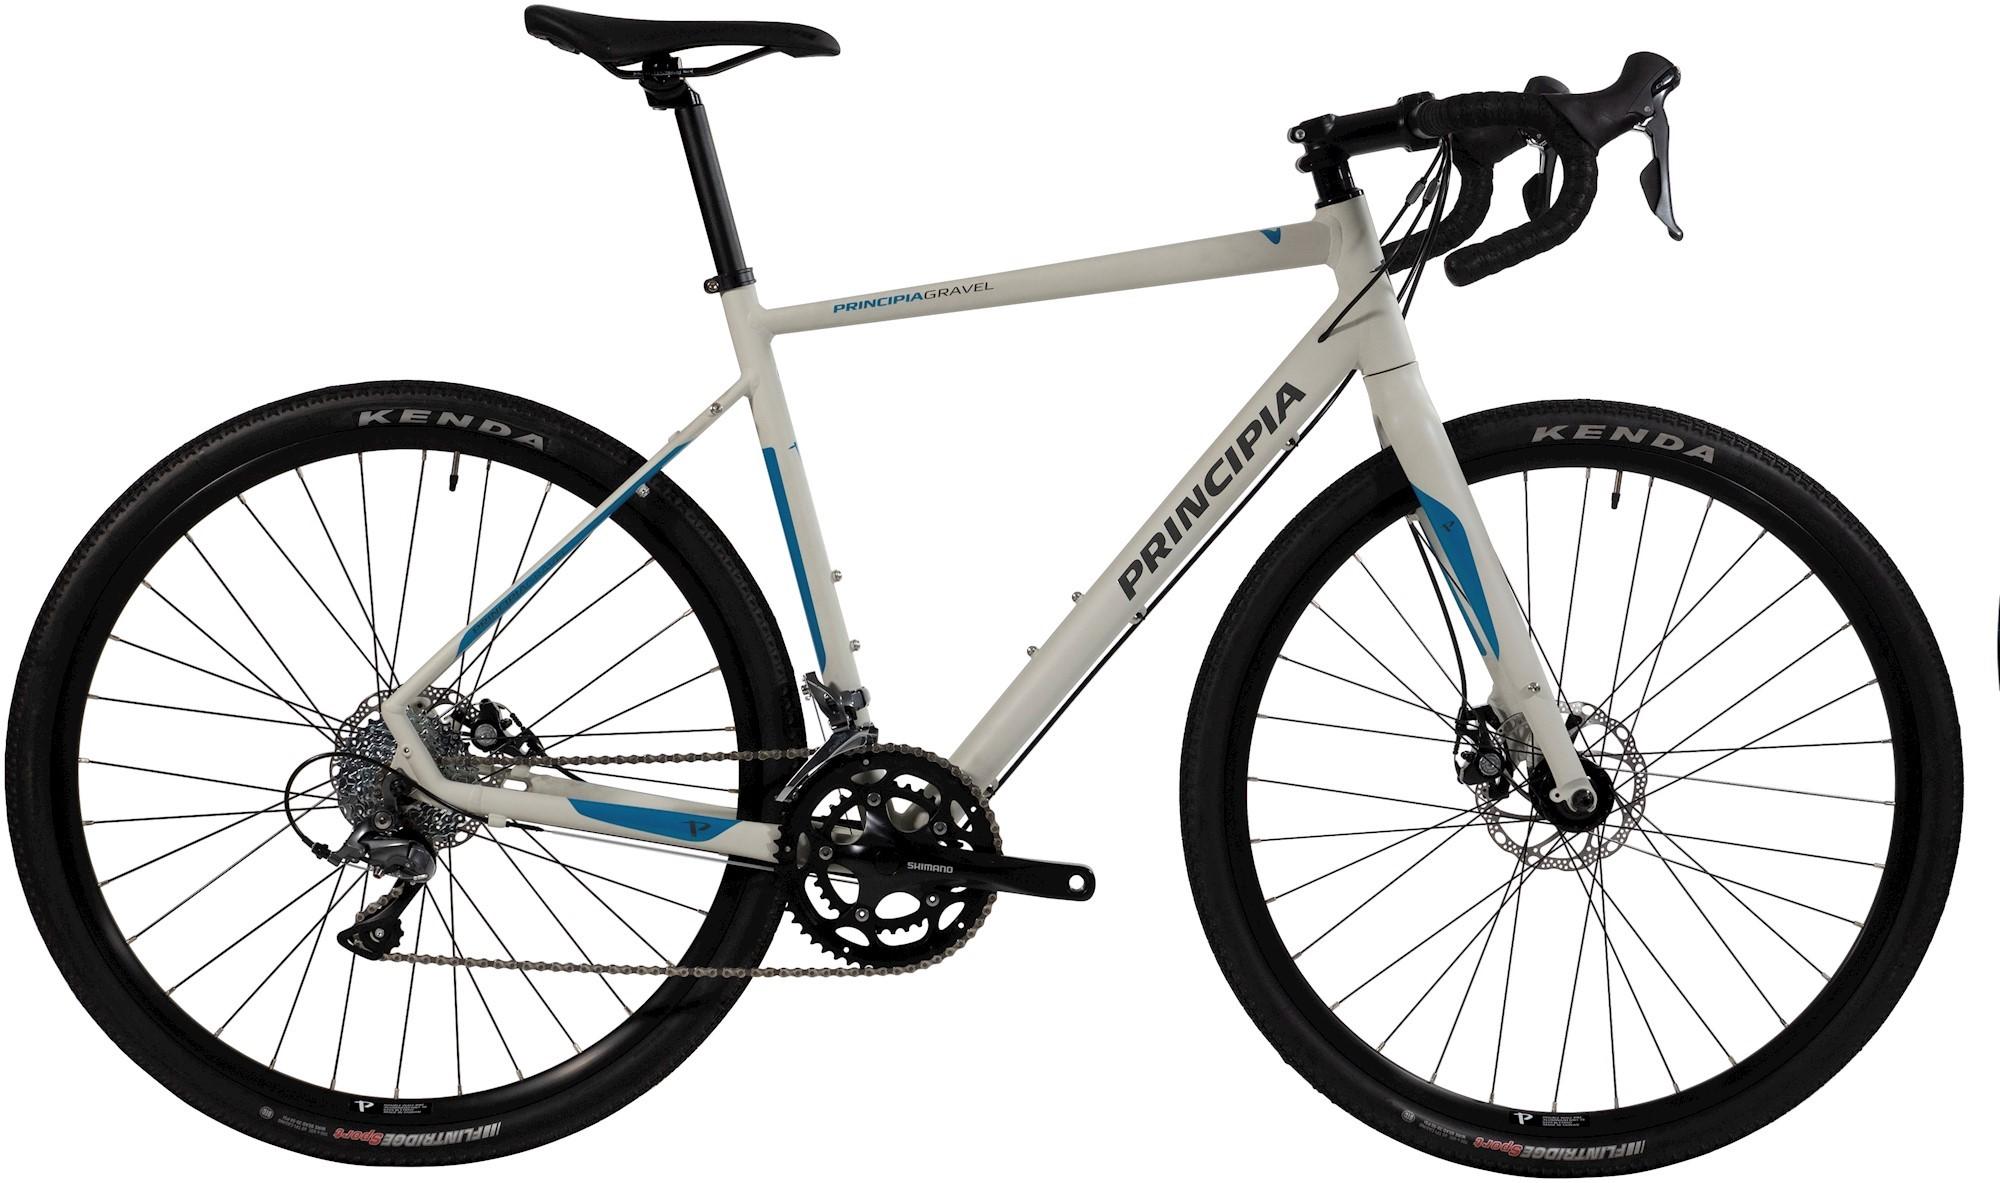 2021 Principia Gravel alu   cross bike